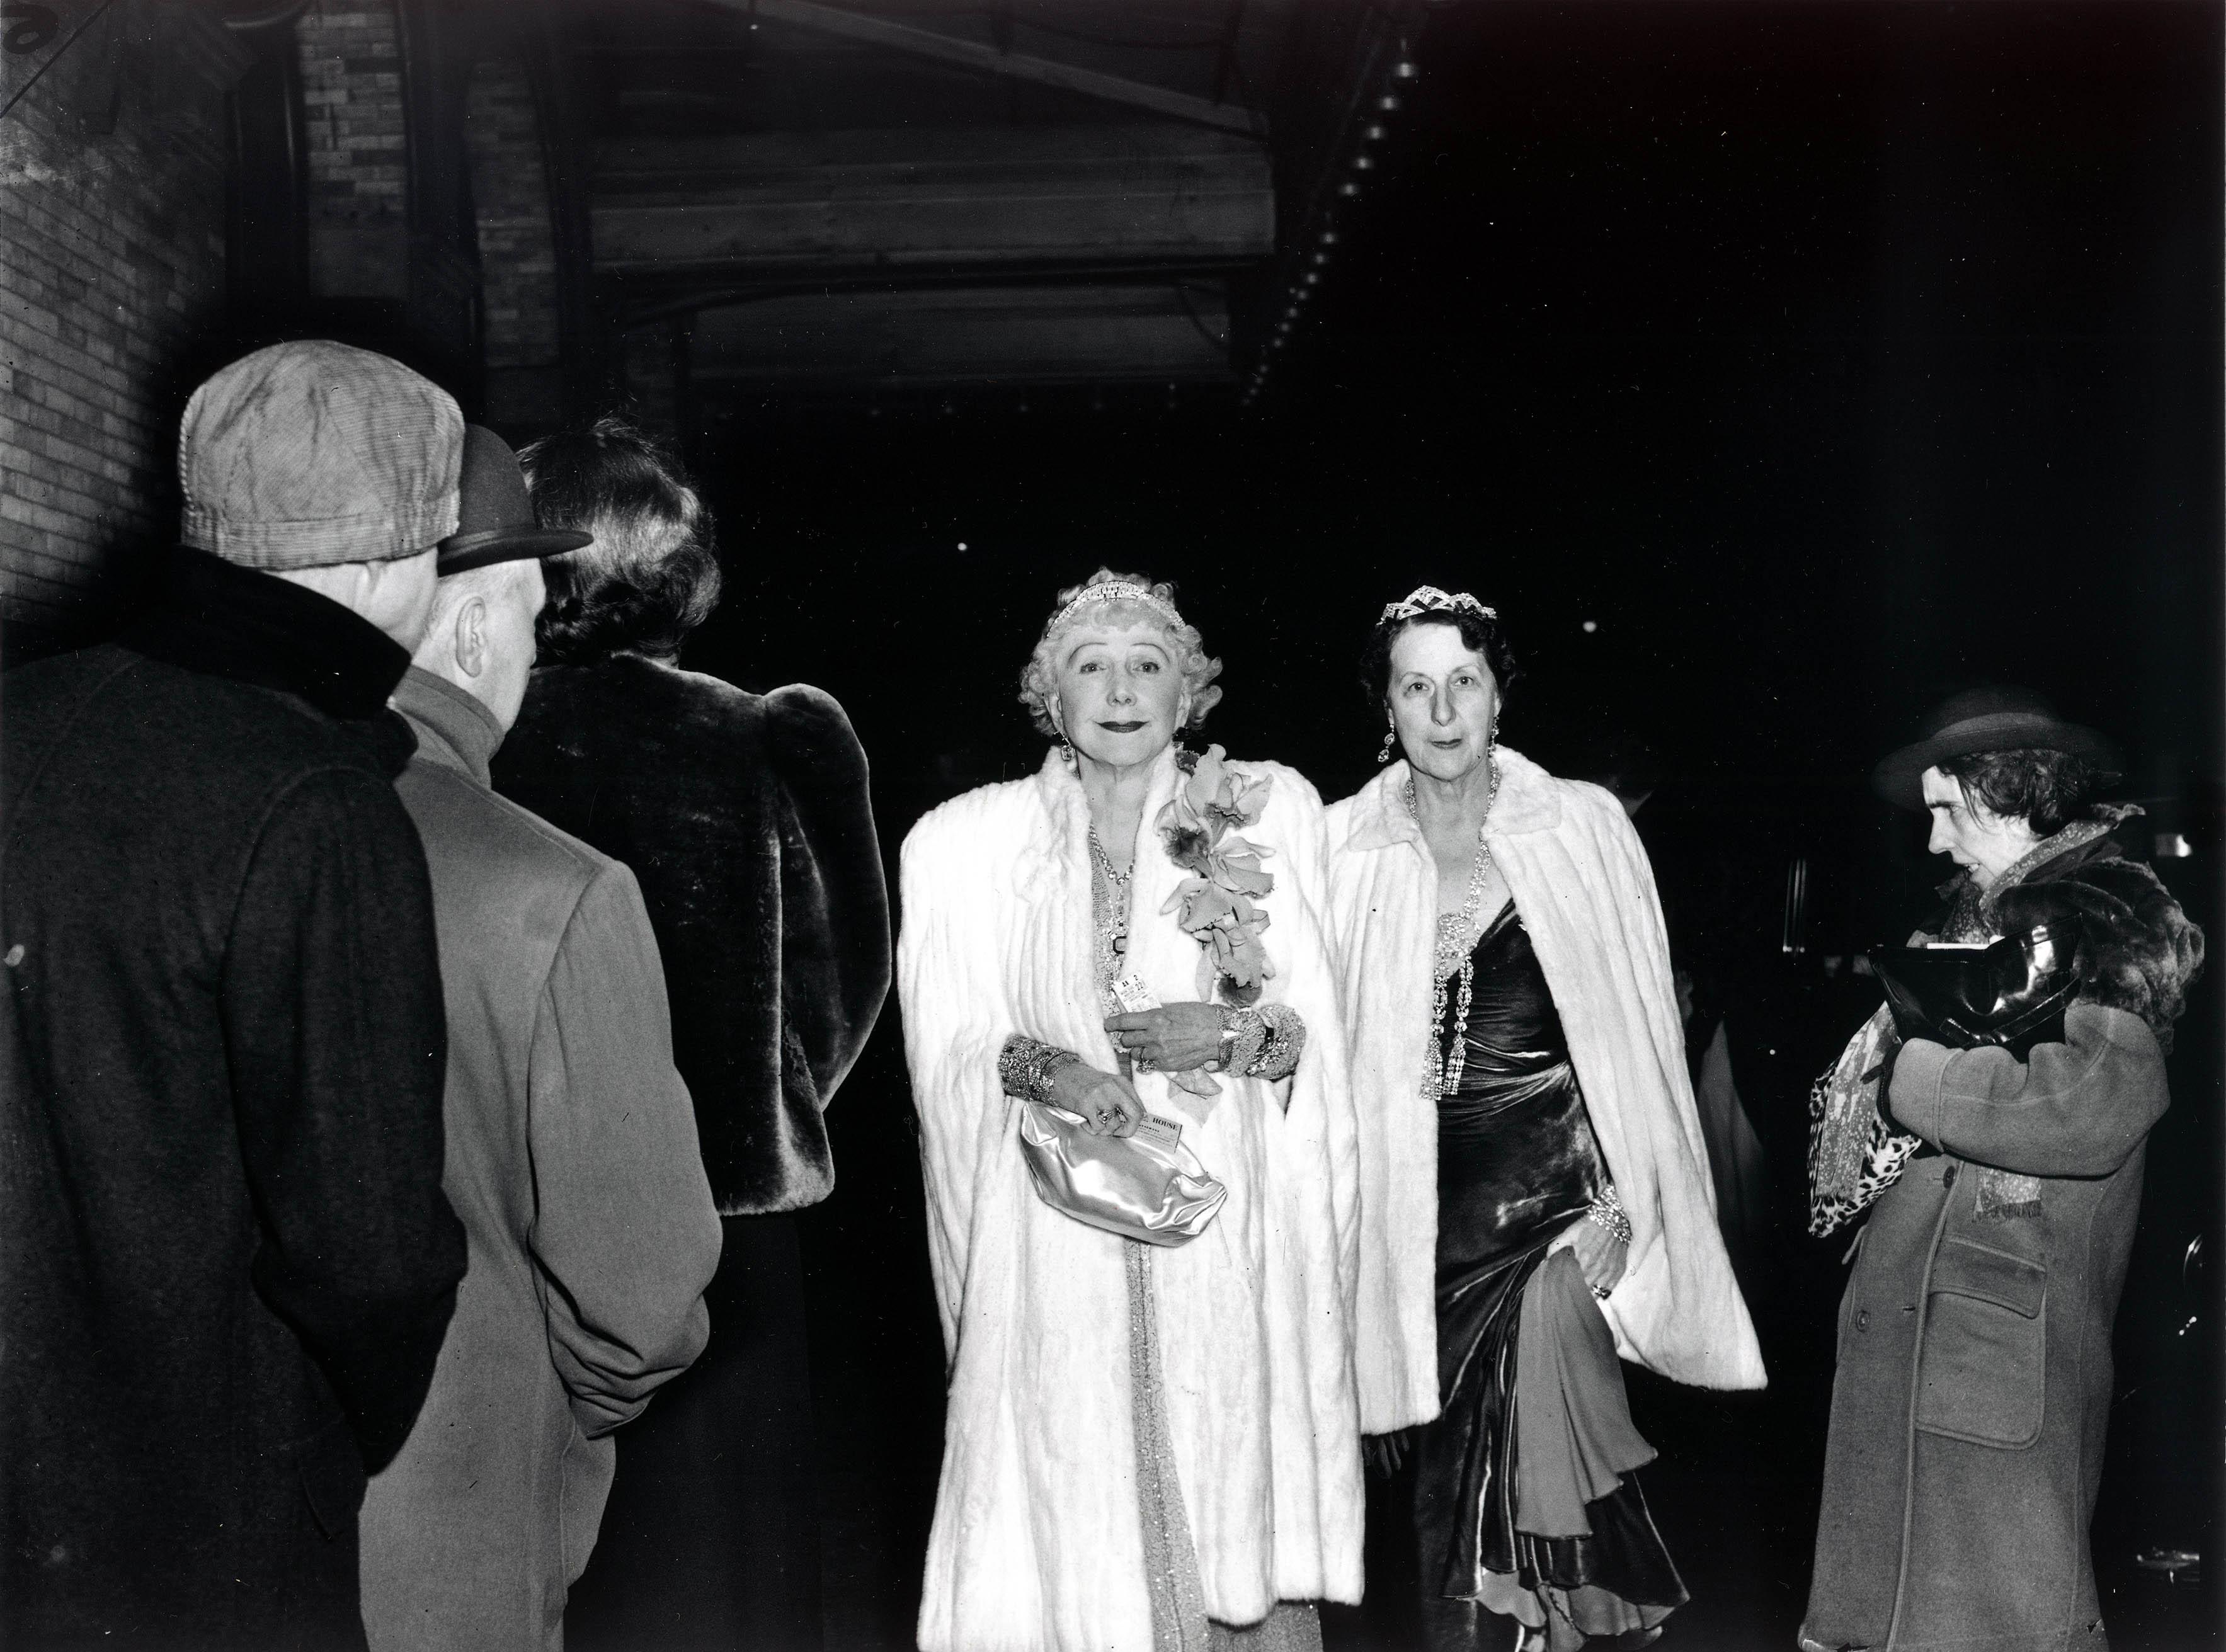 Fotó: Weegee: A kritikus, 1943. december 6.